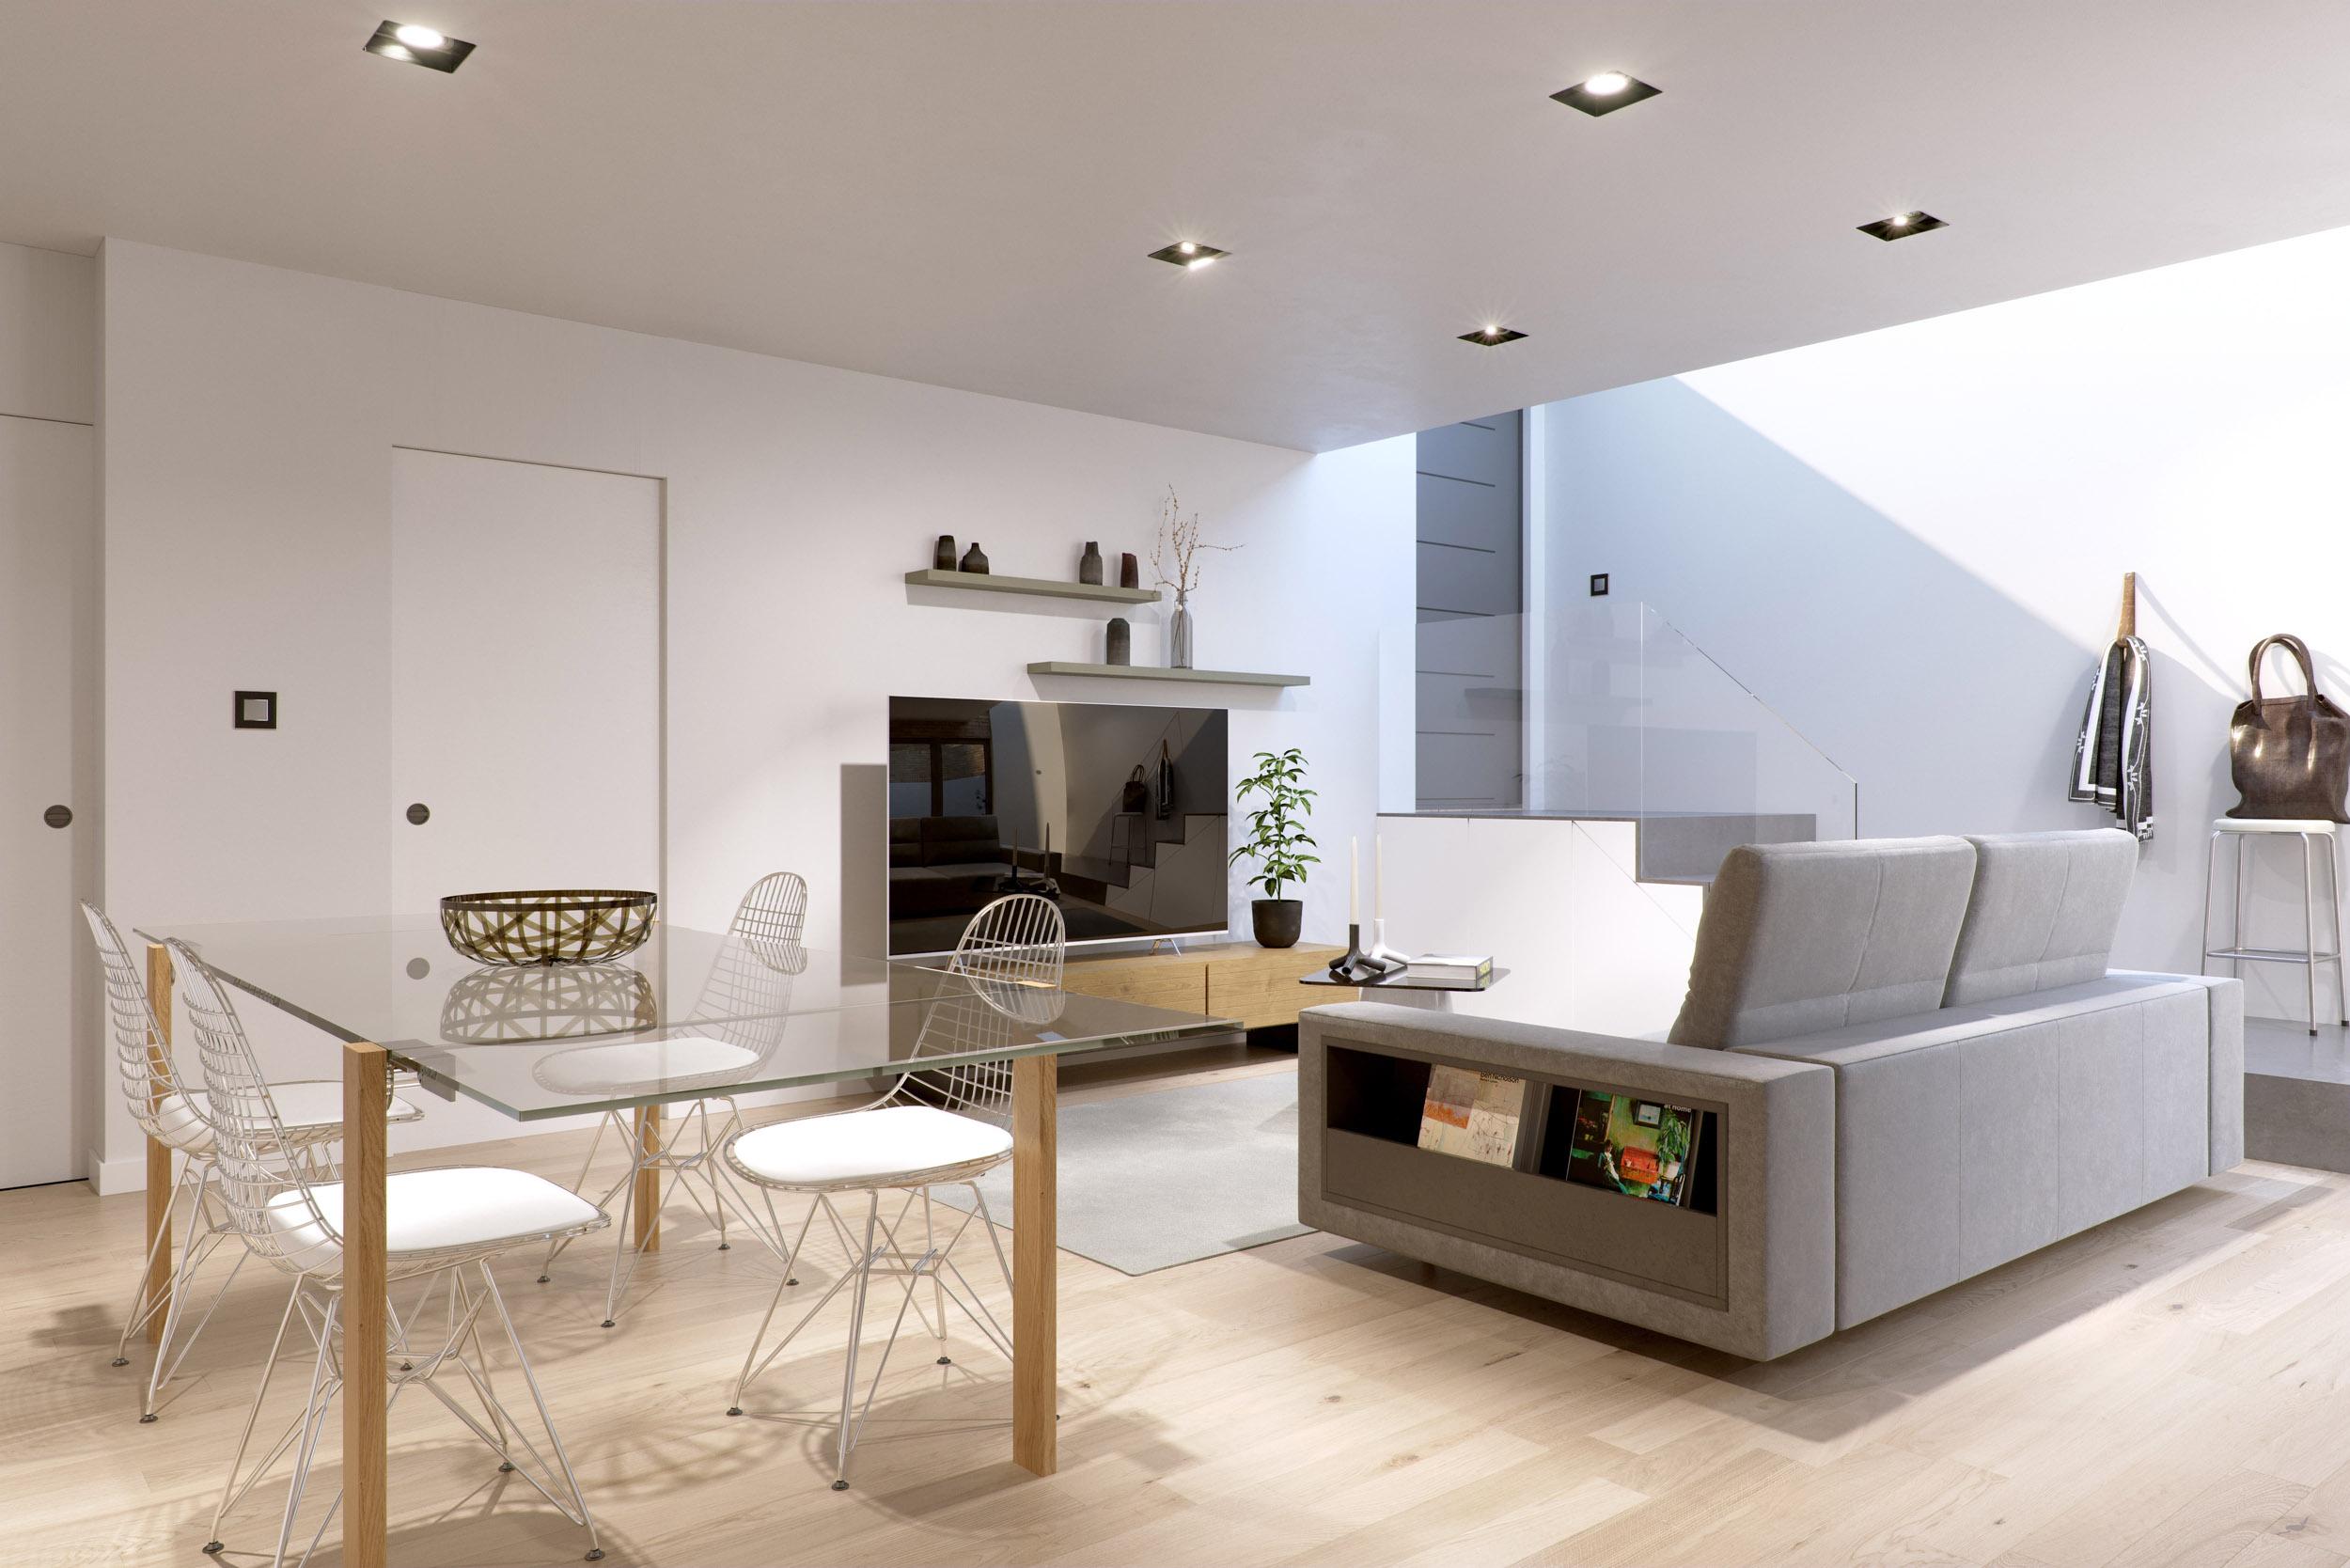 Lanyon-Architectural-Visualisation_010